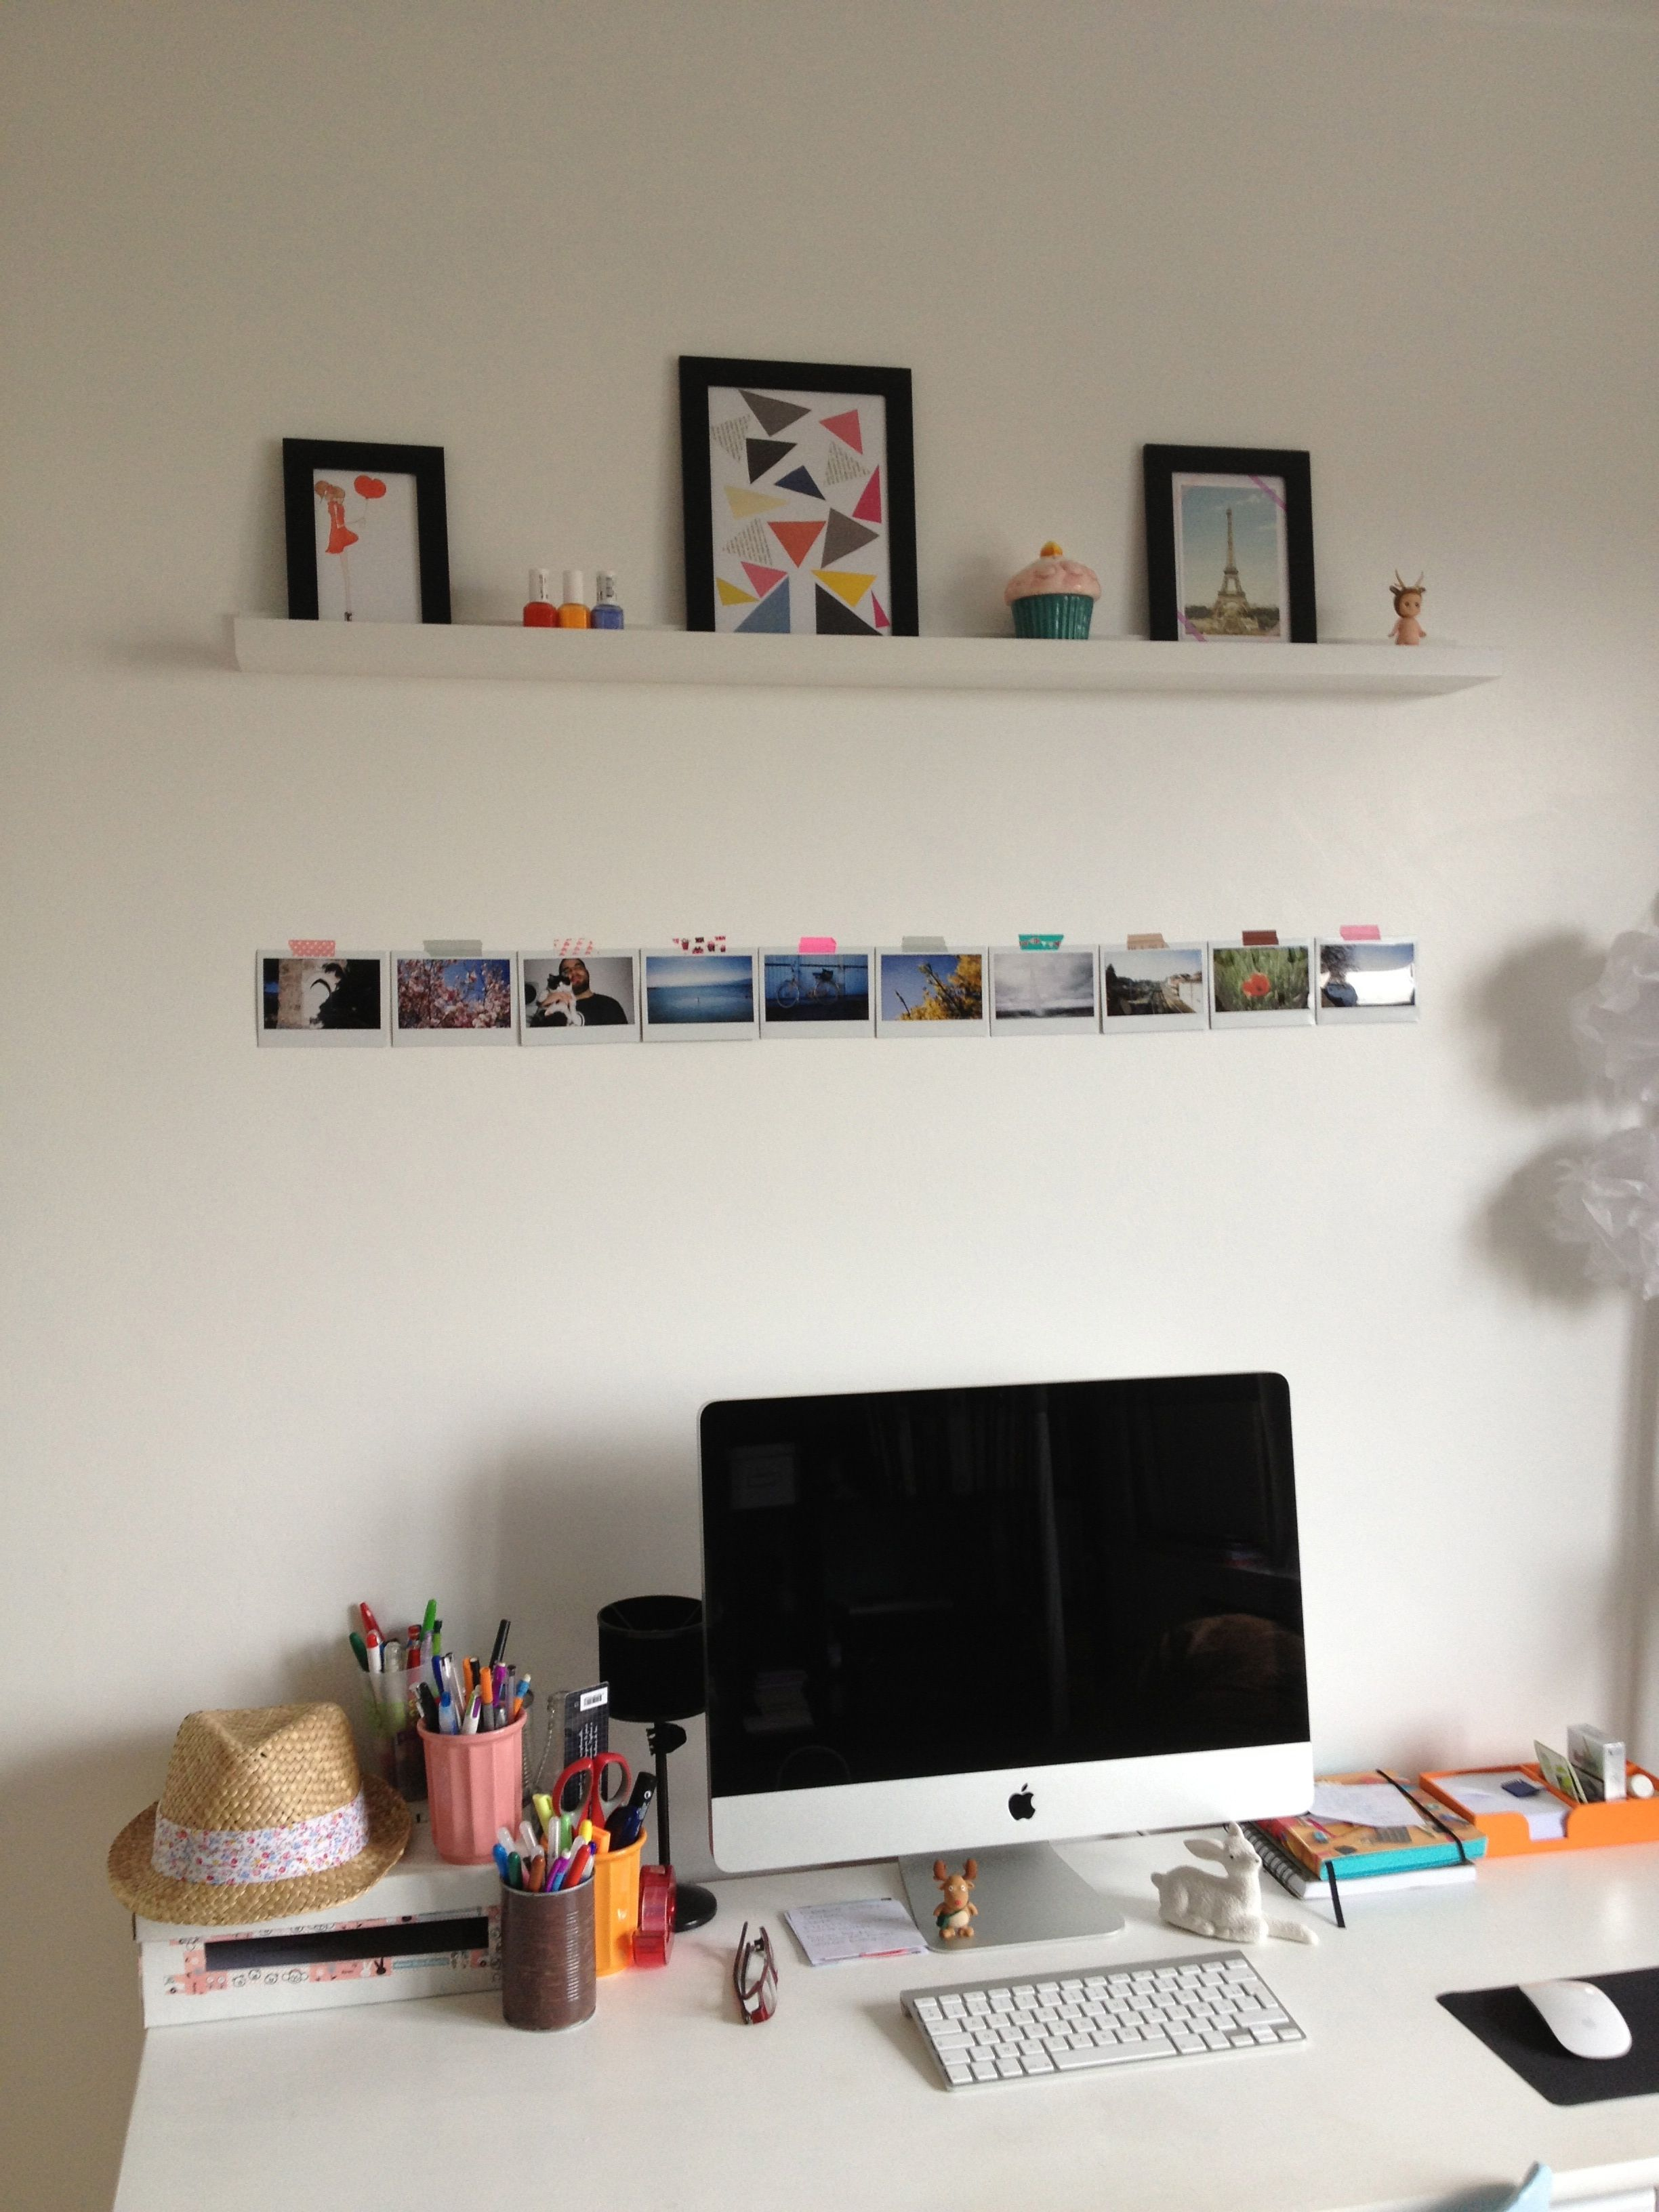 bureau vintage id es d co pastel etag re cadres. Black Bedroom Furniture Sets. Home Design Ideas